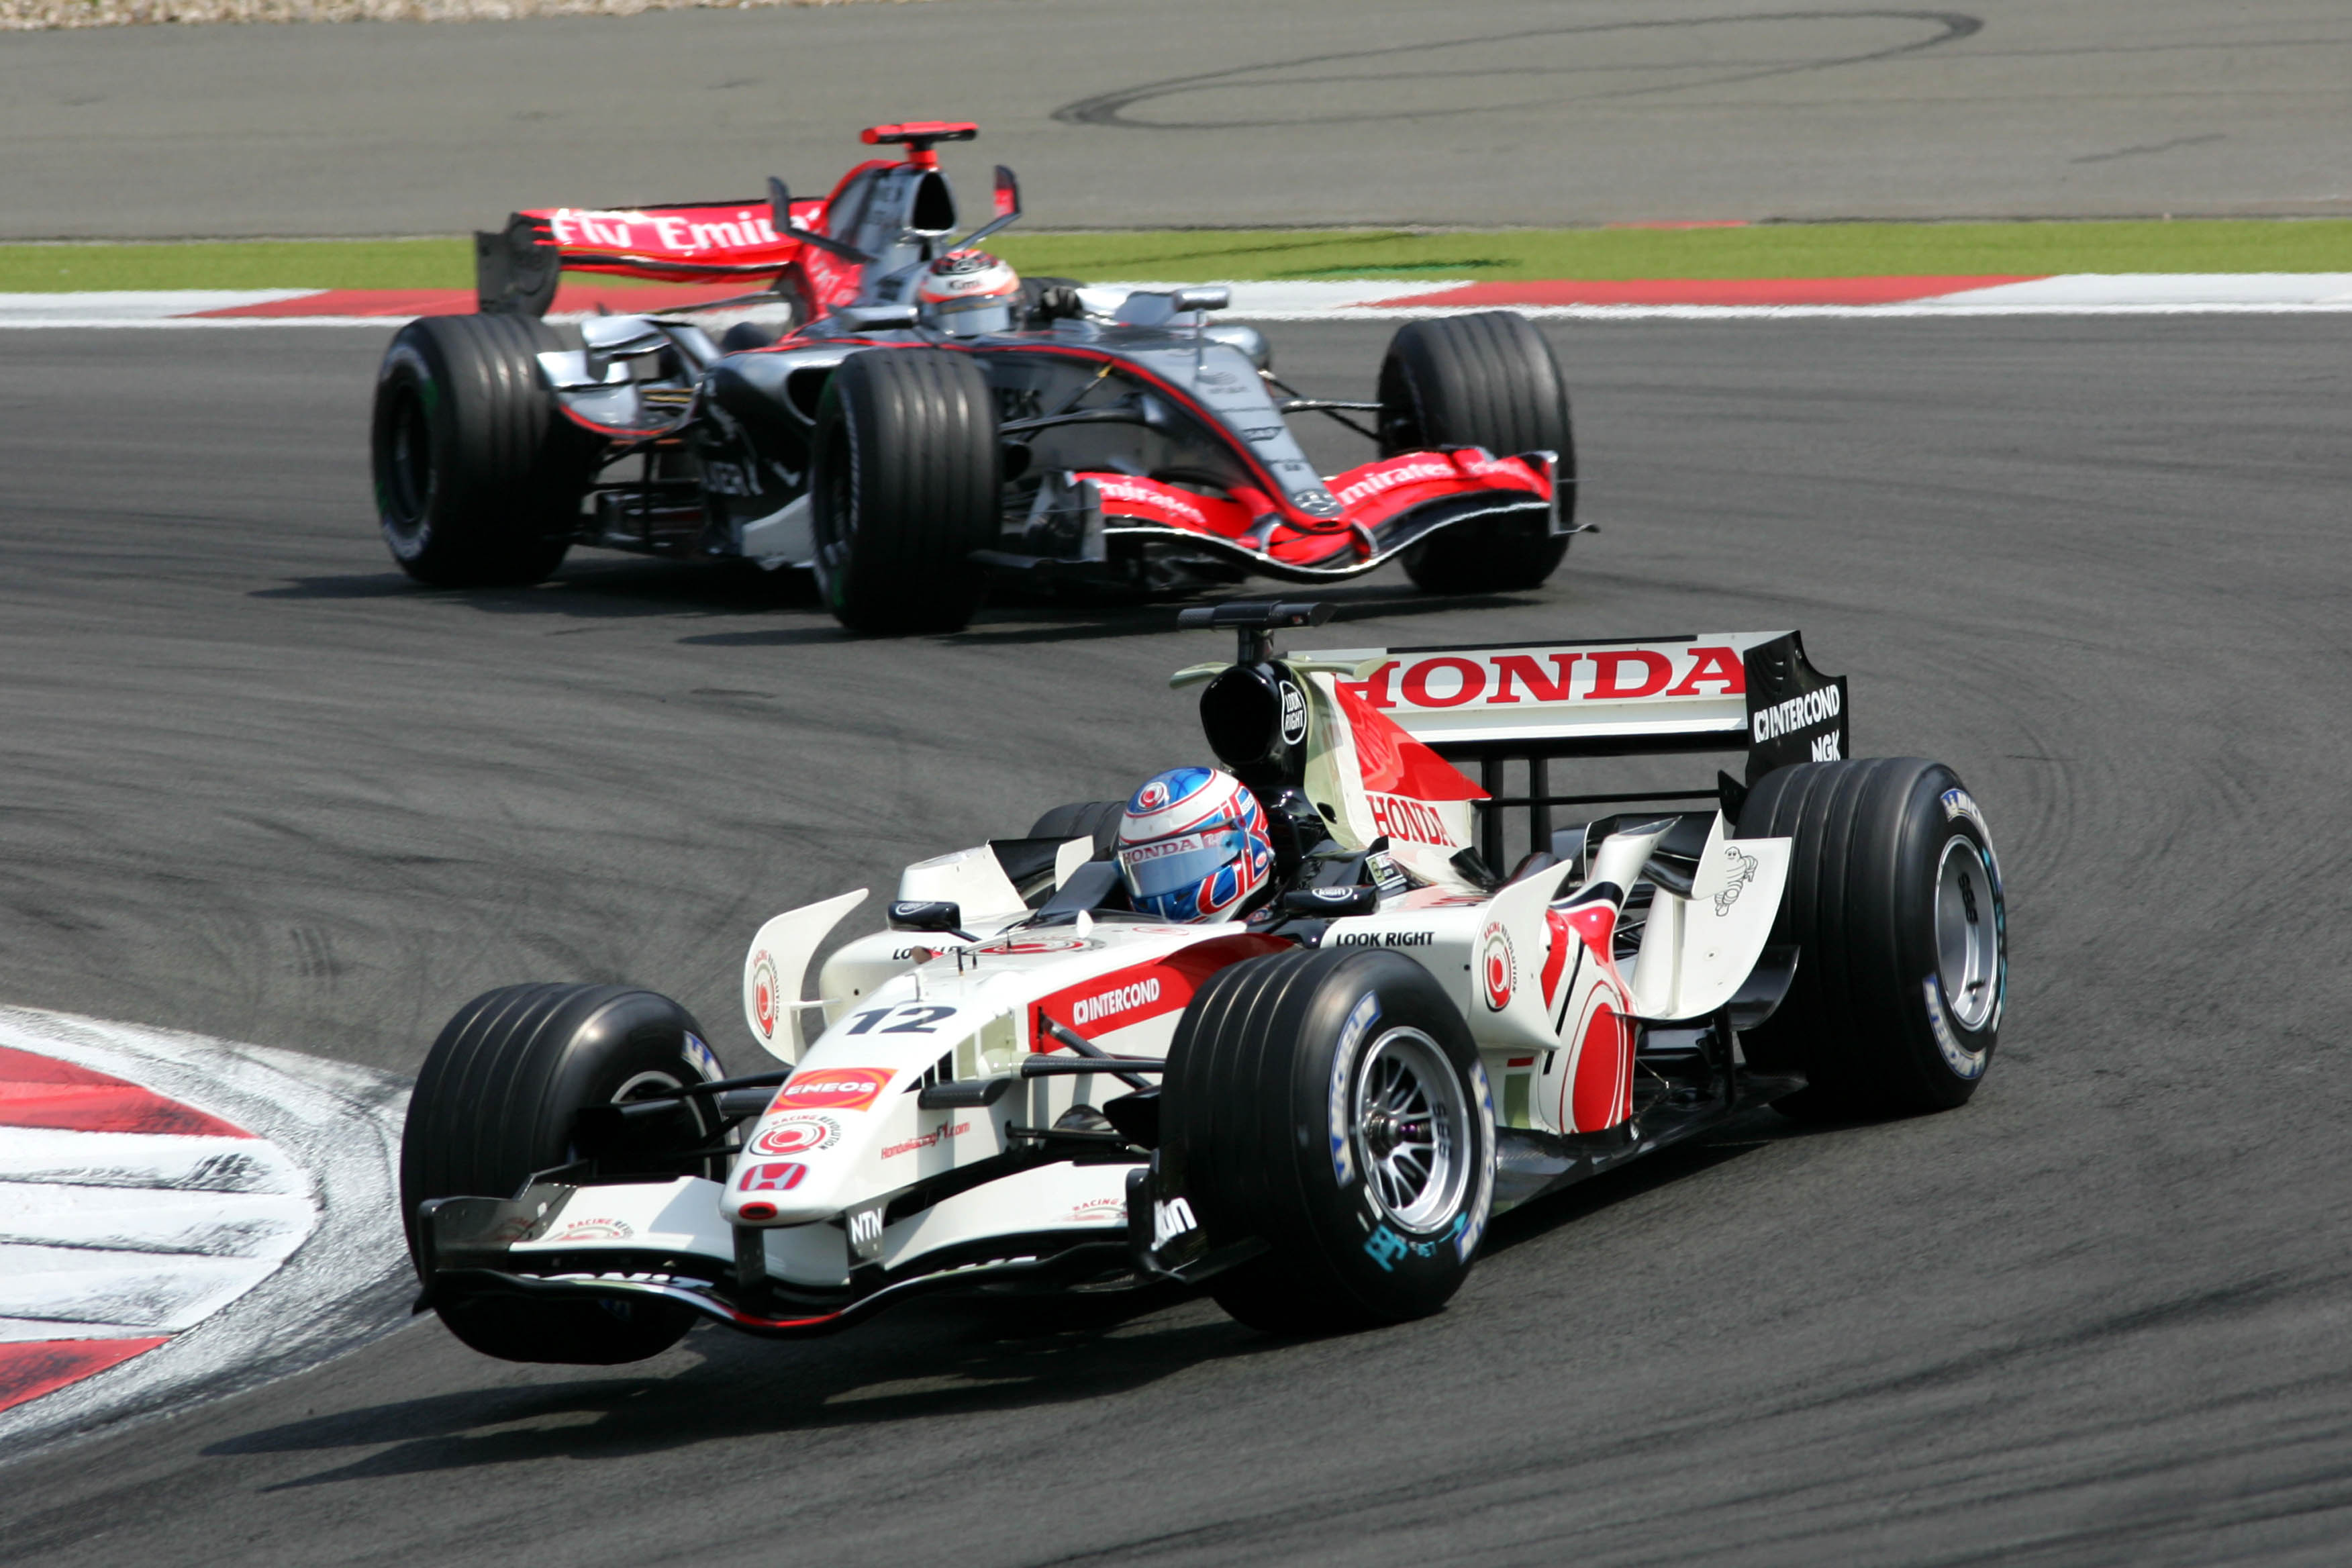 Formula 1 Grand Prix, Germany, Sunday Race